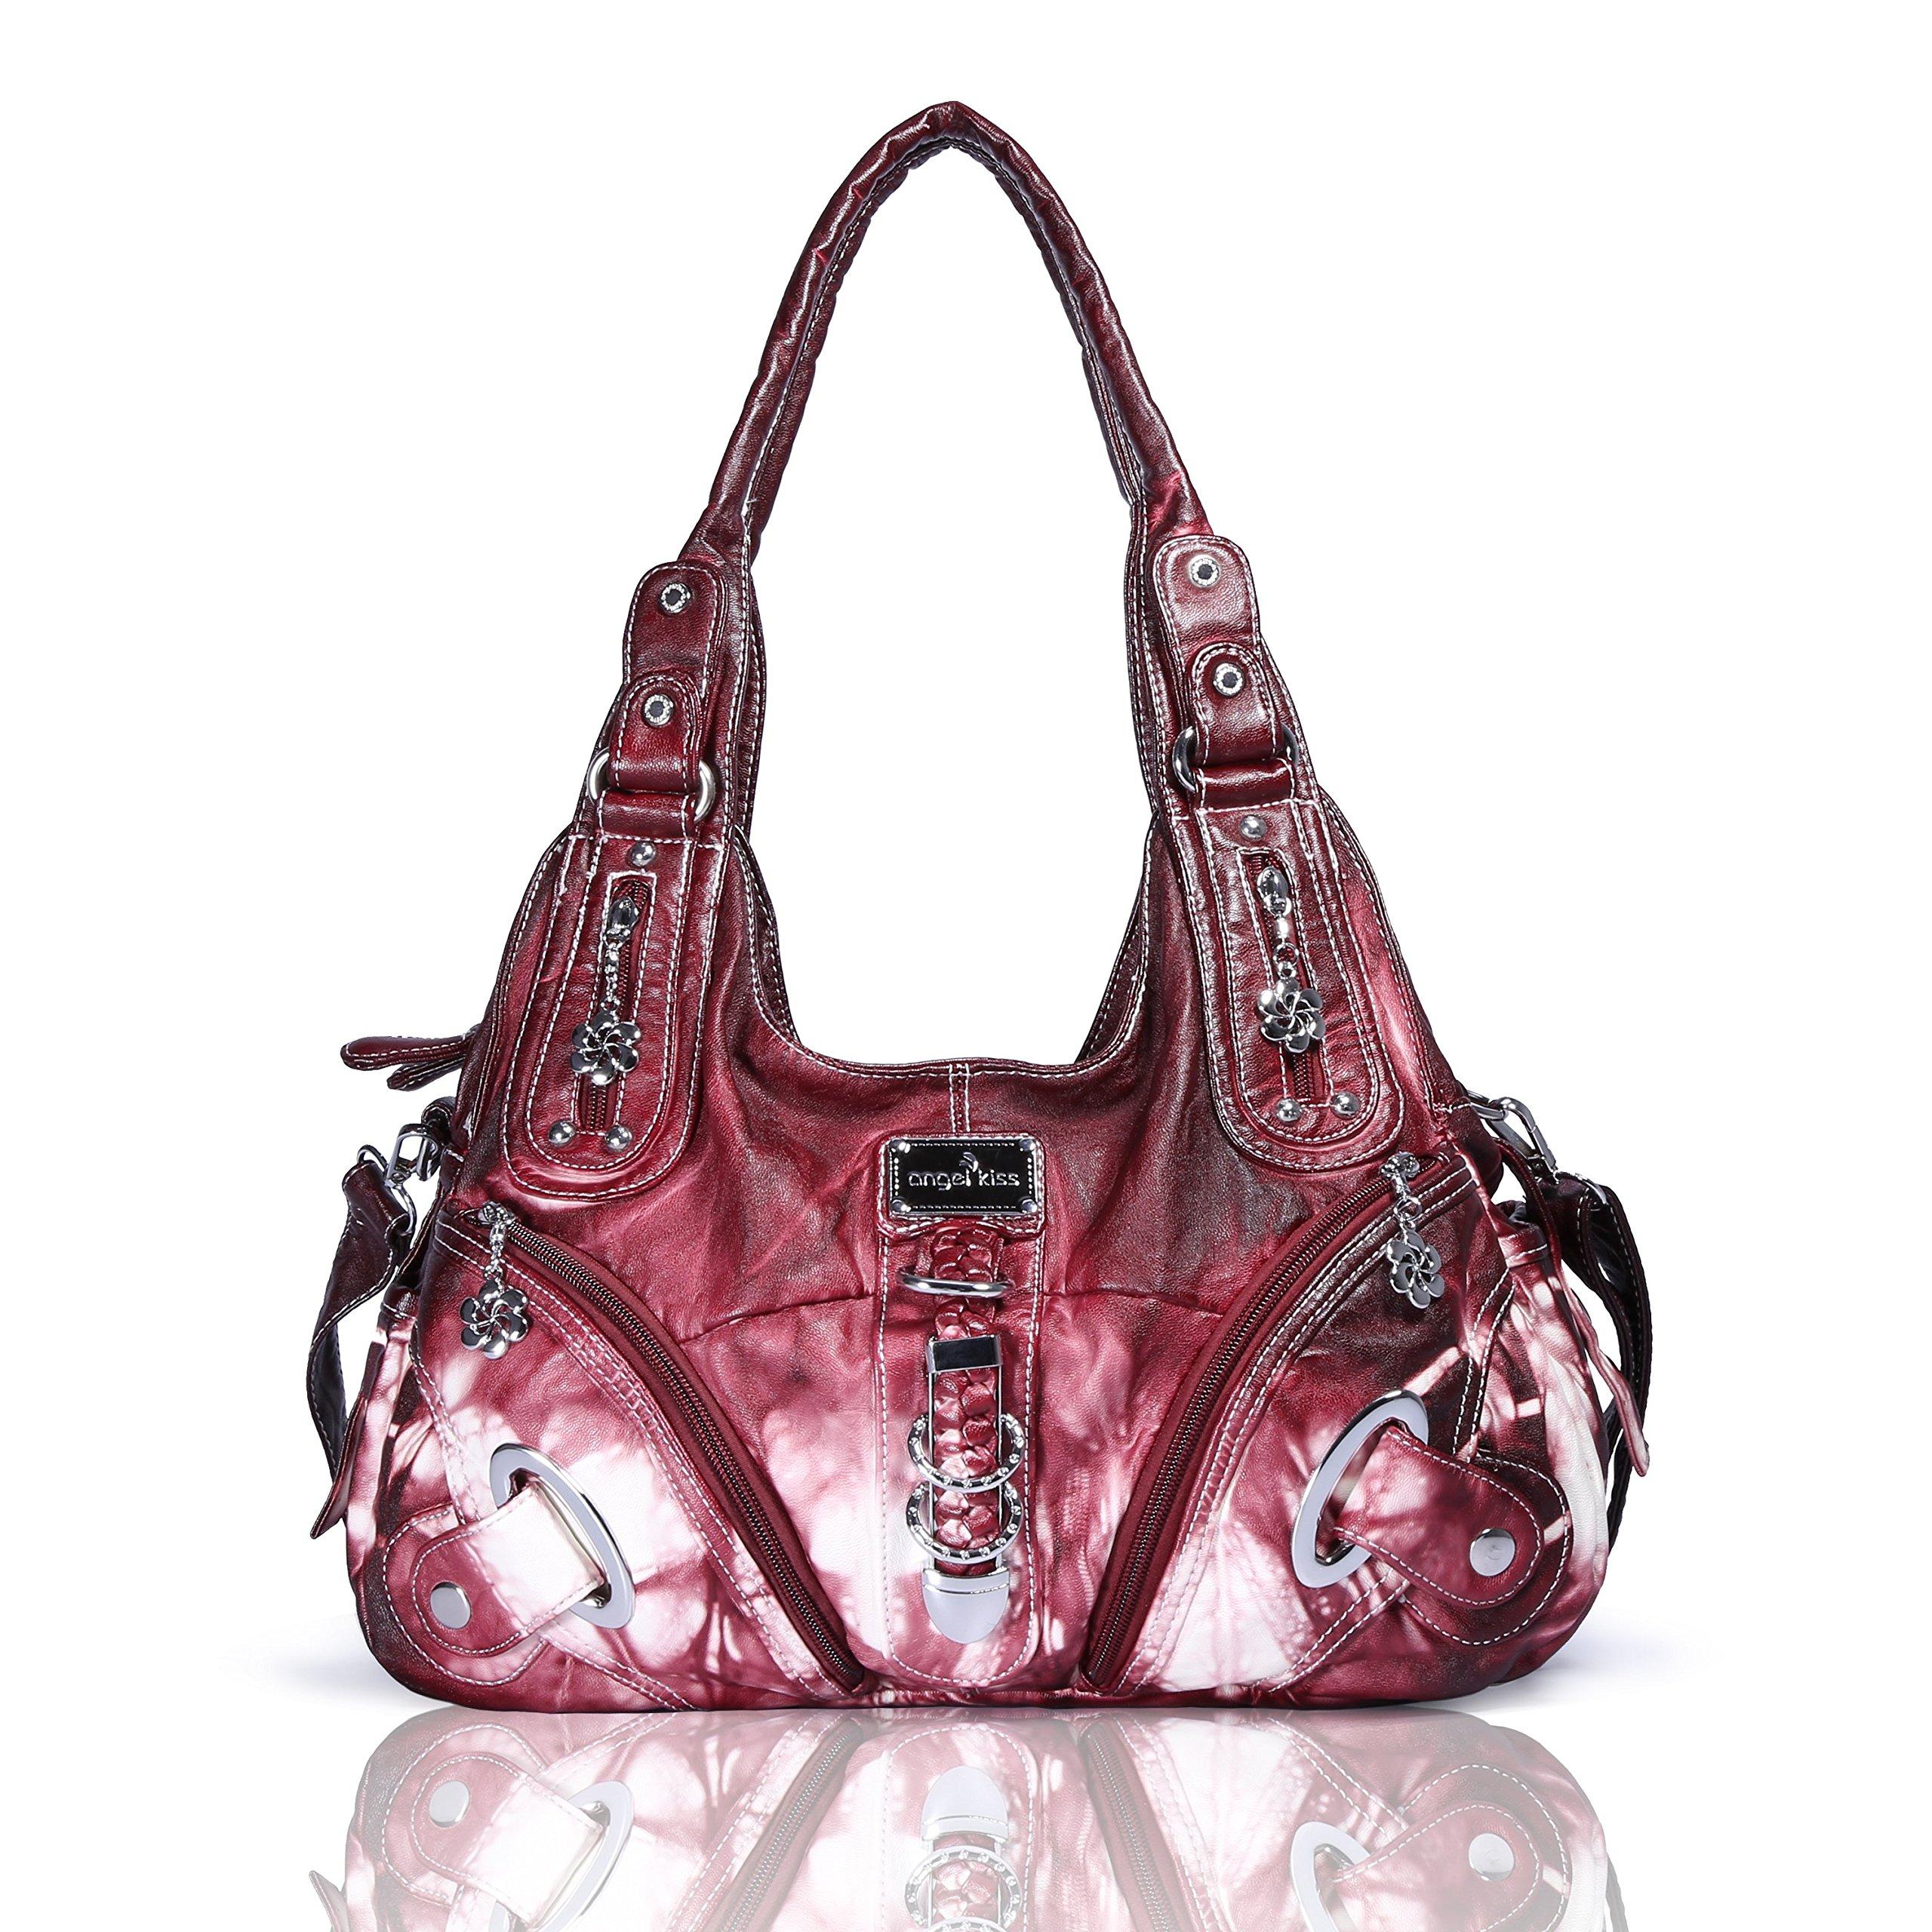 4ad0b147c5 Angelkiss Purses Handbags for Women Waterproof PU Leather Large Hobo  Shoulder Bags Top-Handle Tote